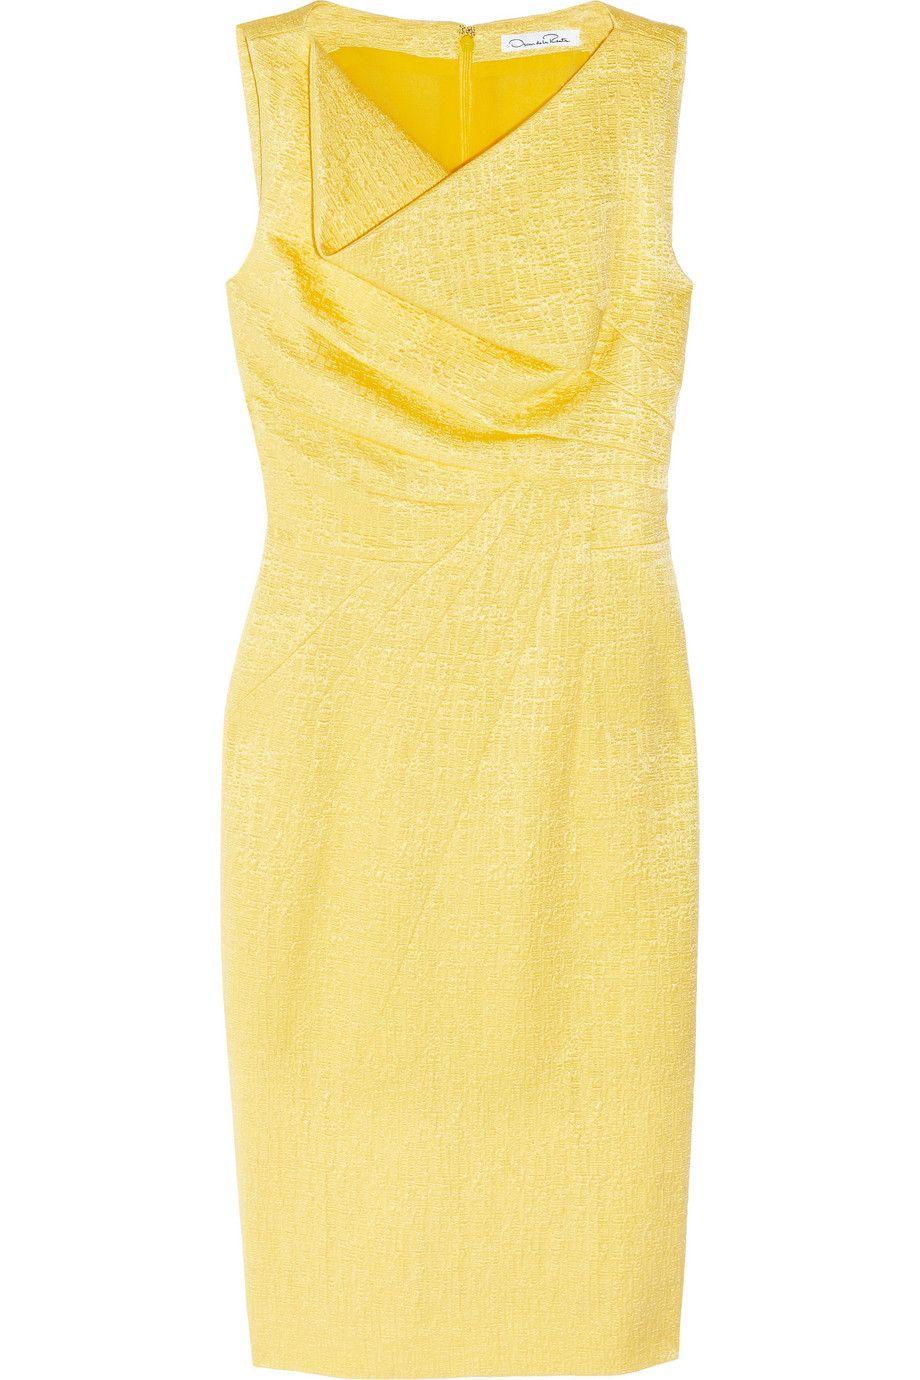 Oscar de la renta cotton and silkblend brocade dress